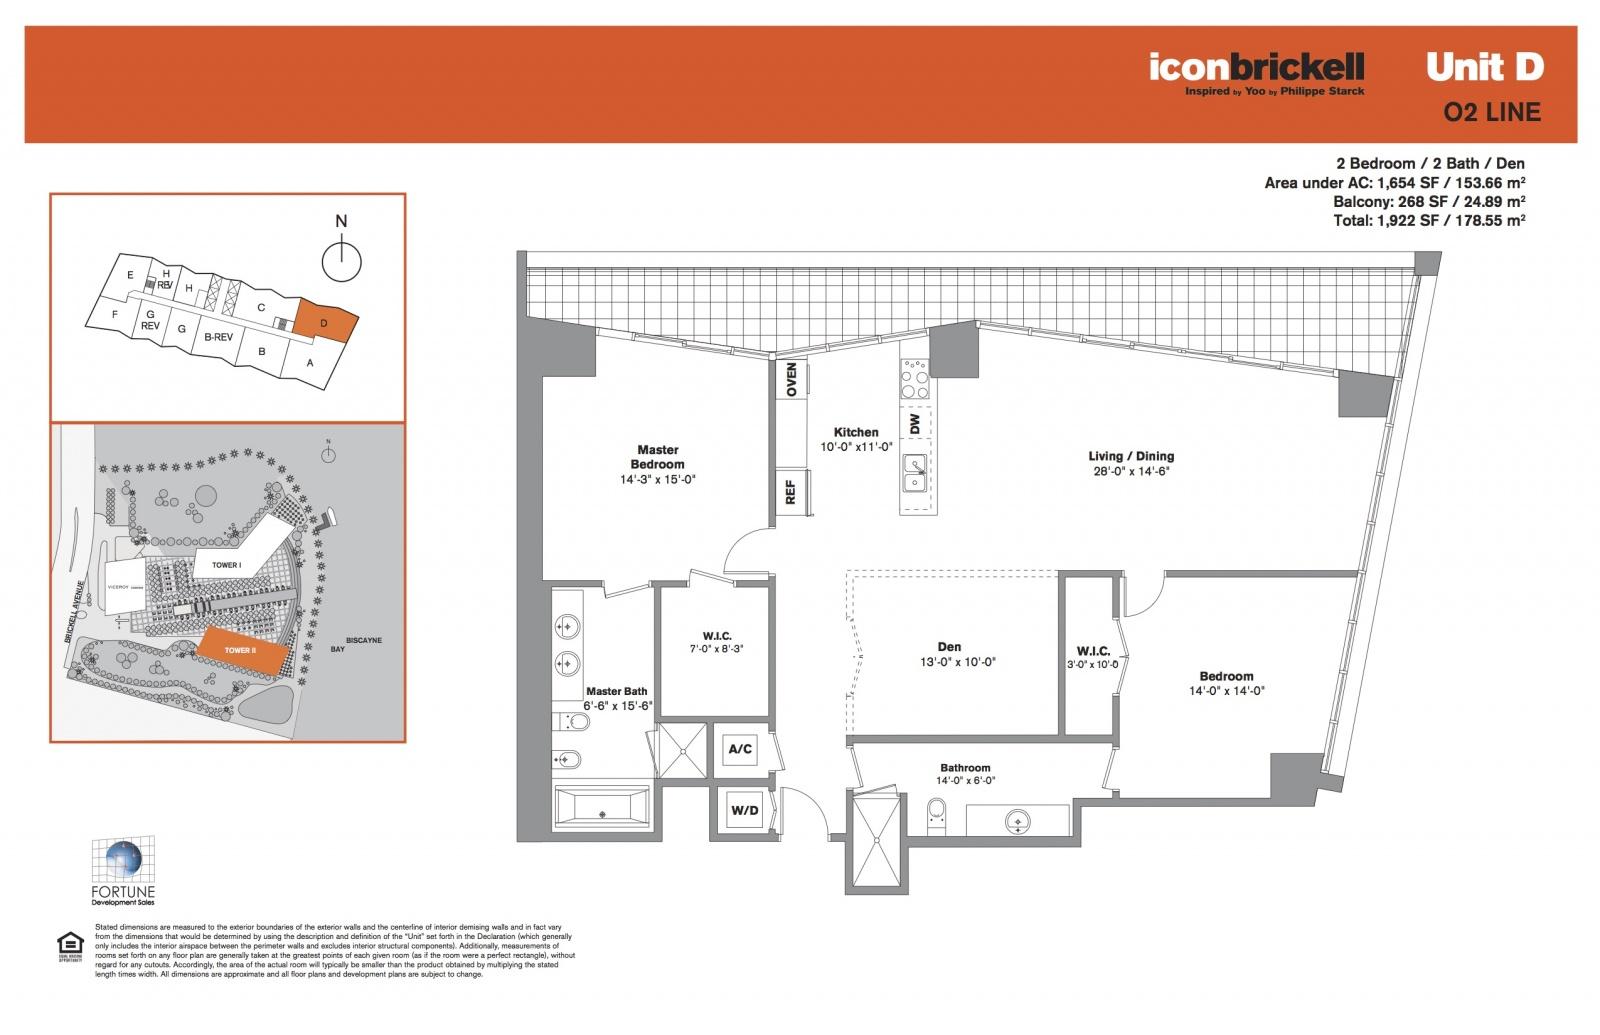 Icon Brickell Two, line 02 floor plan